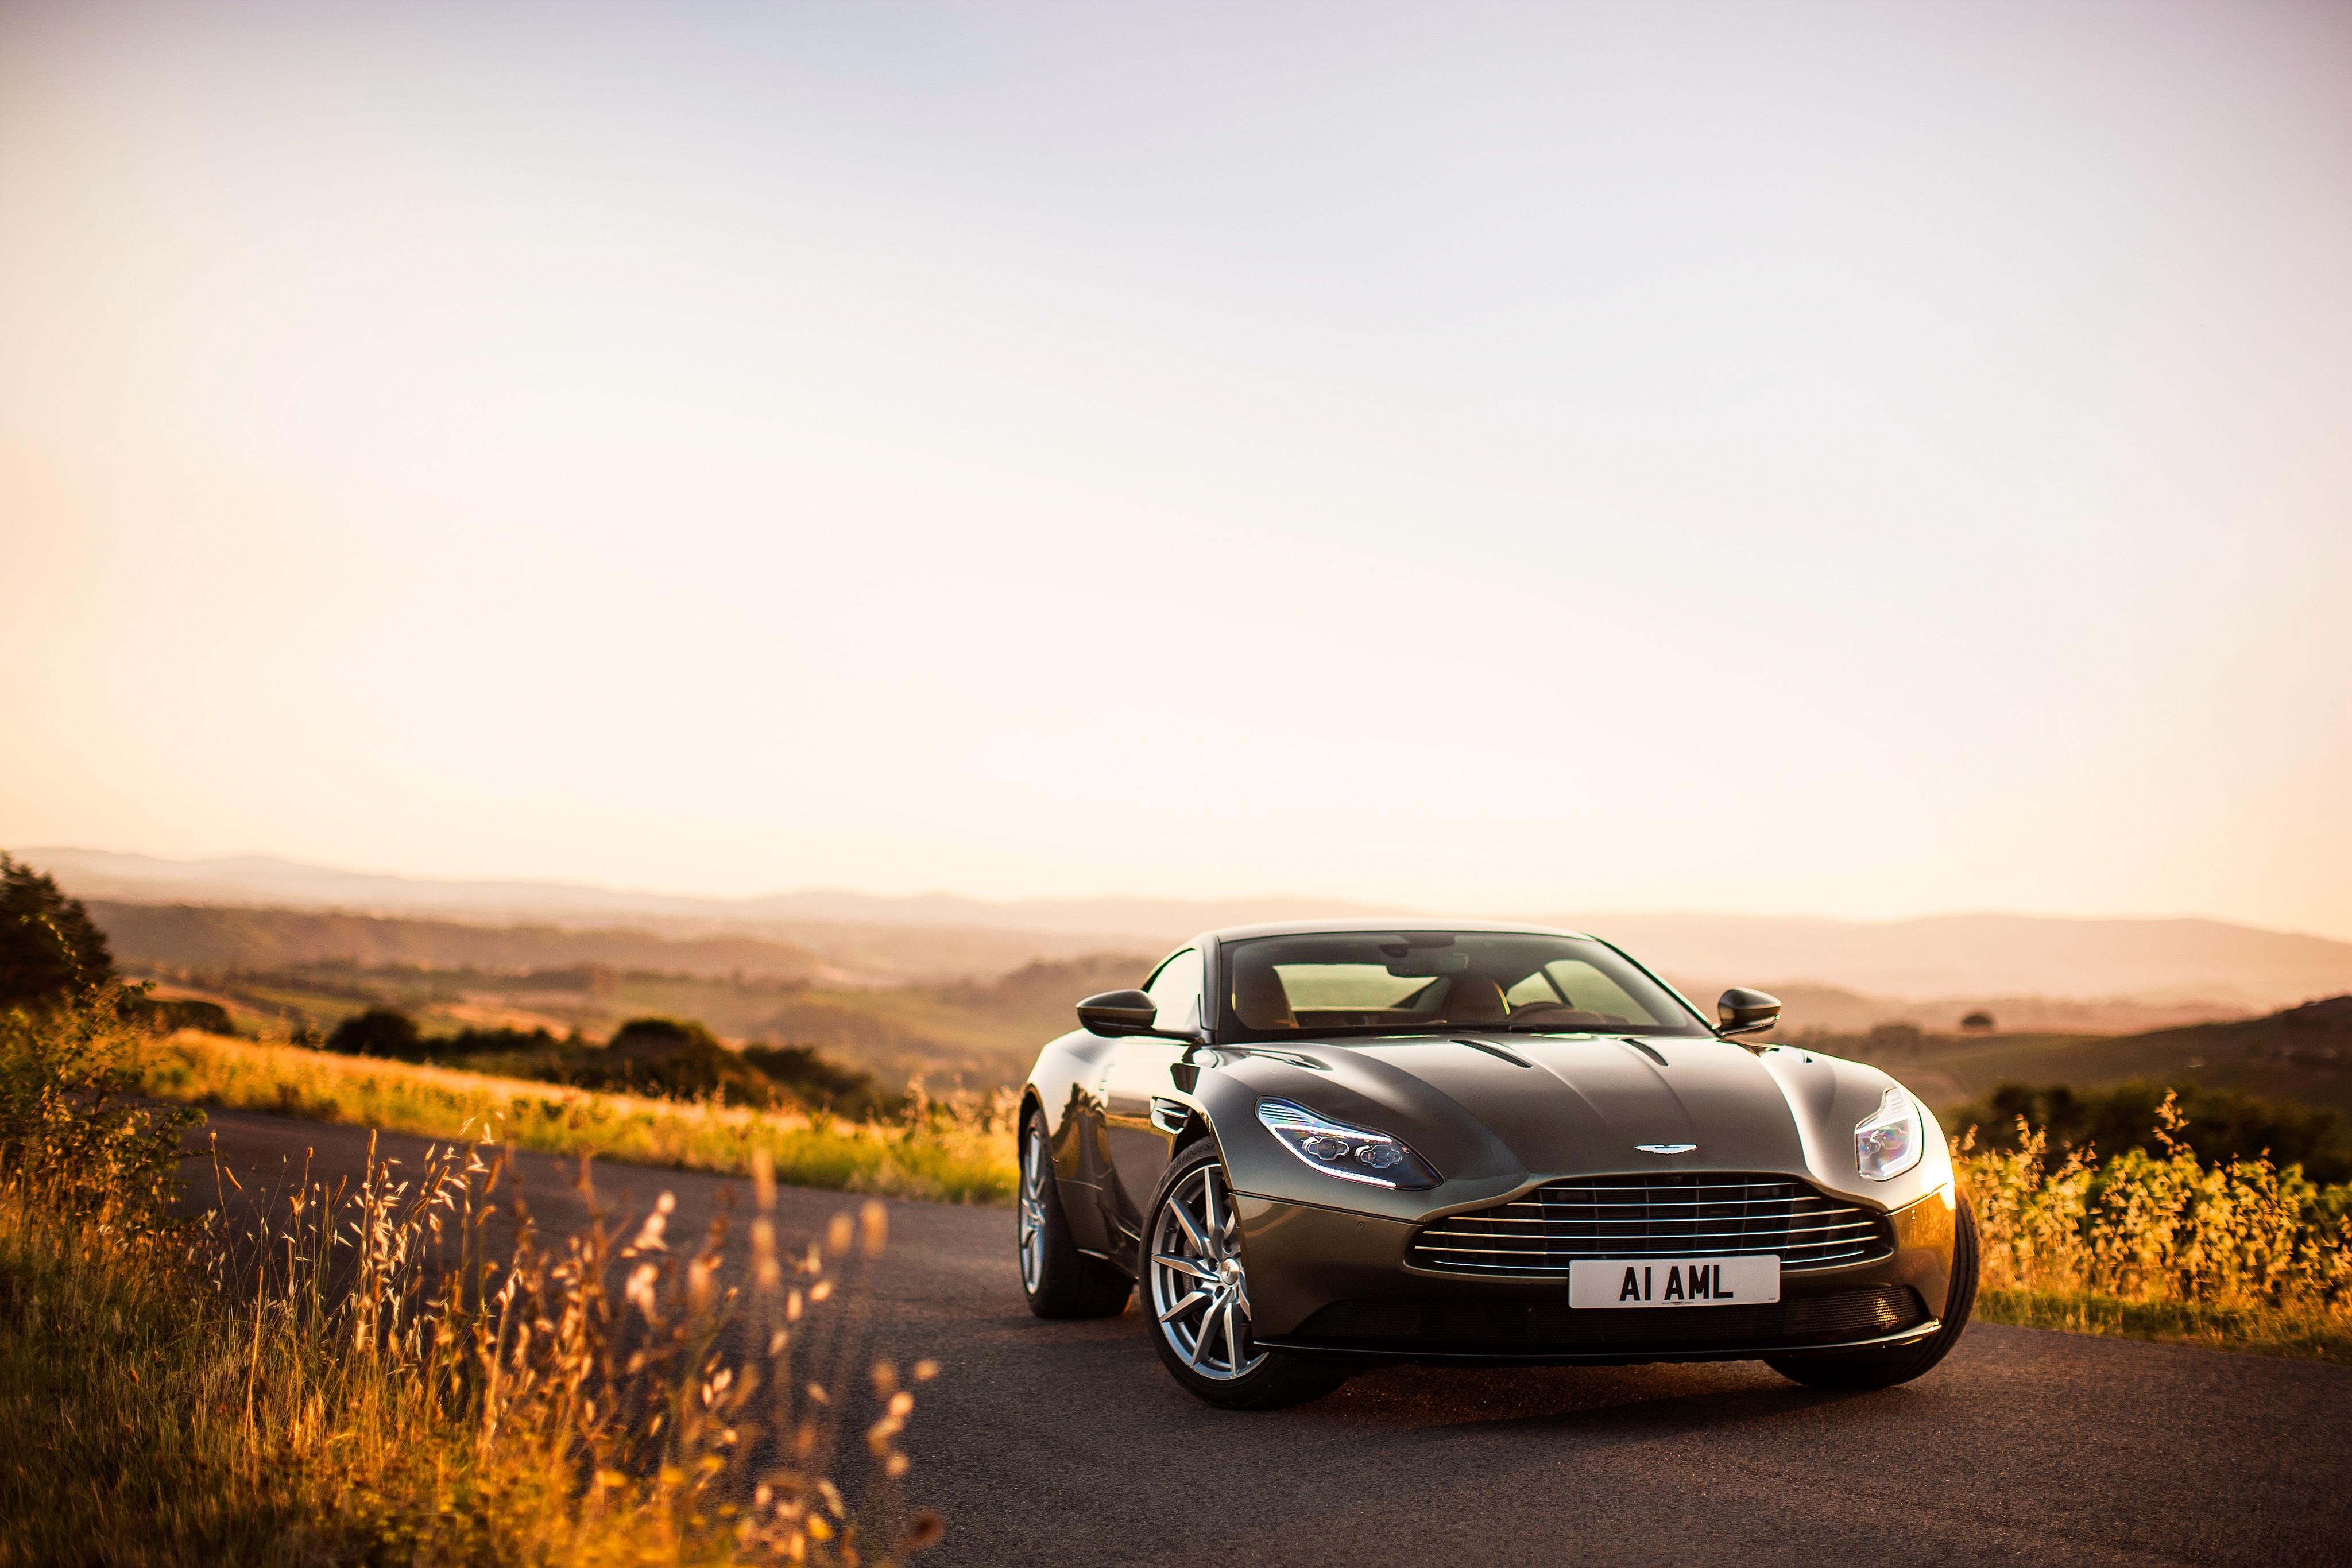 154135 Заставки и Обои Астон Мартин (Aston Martin) на телефон. Скачать Вид Спереди, Астон Мартин (Aston Martin), Тачки (Cars), Db11 картинки бесплатно